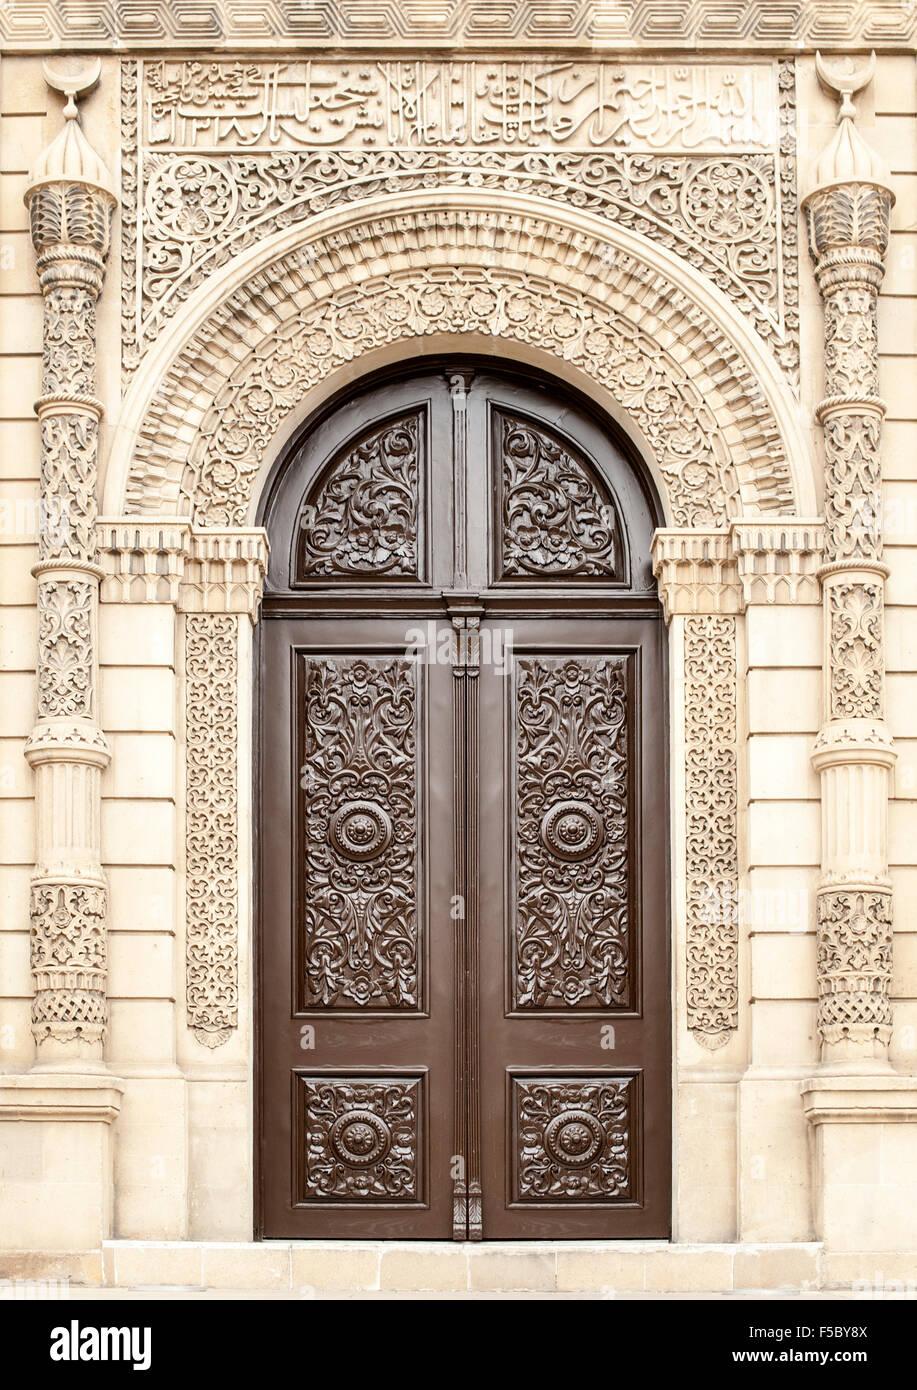 Doors of the Juma Mosque (Cümə Məscidi) in the old town in Baku, the capital of Azerbaijan. - Stock Image